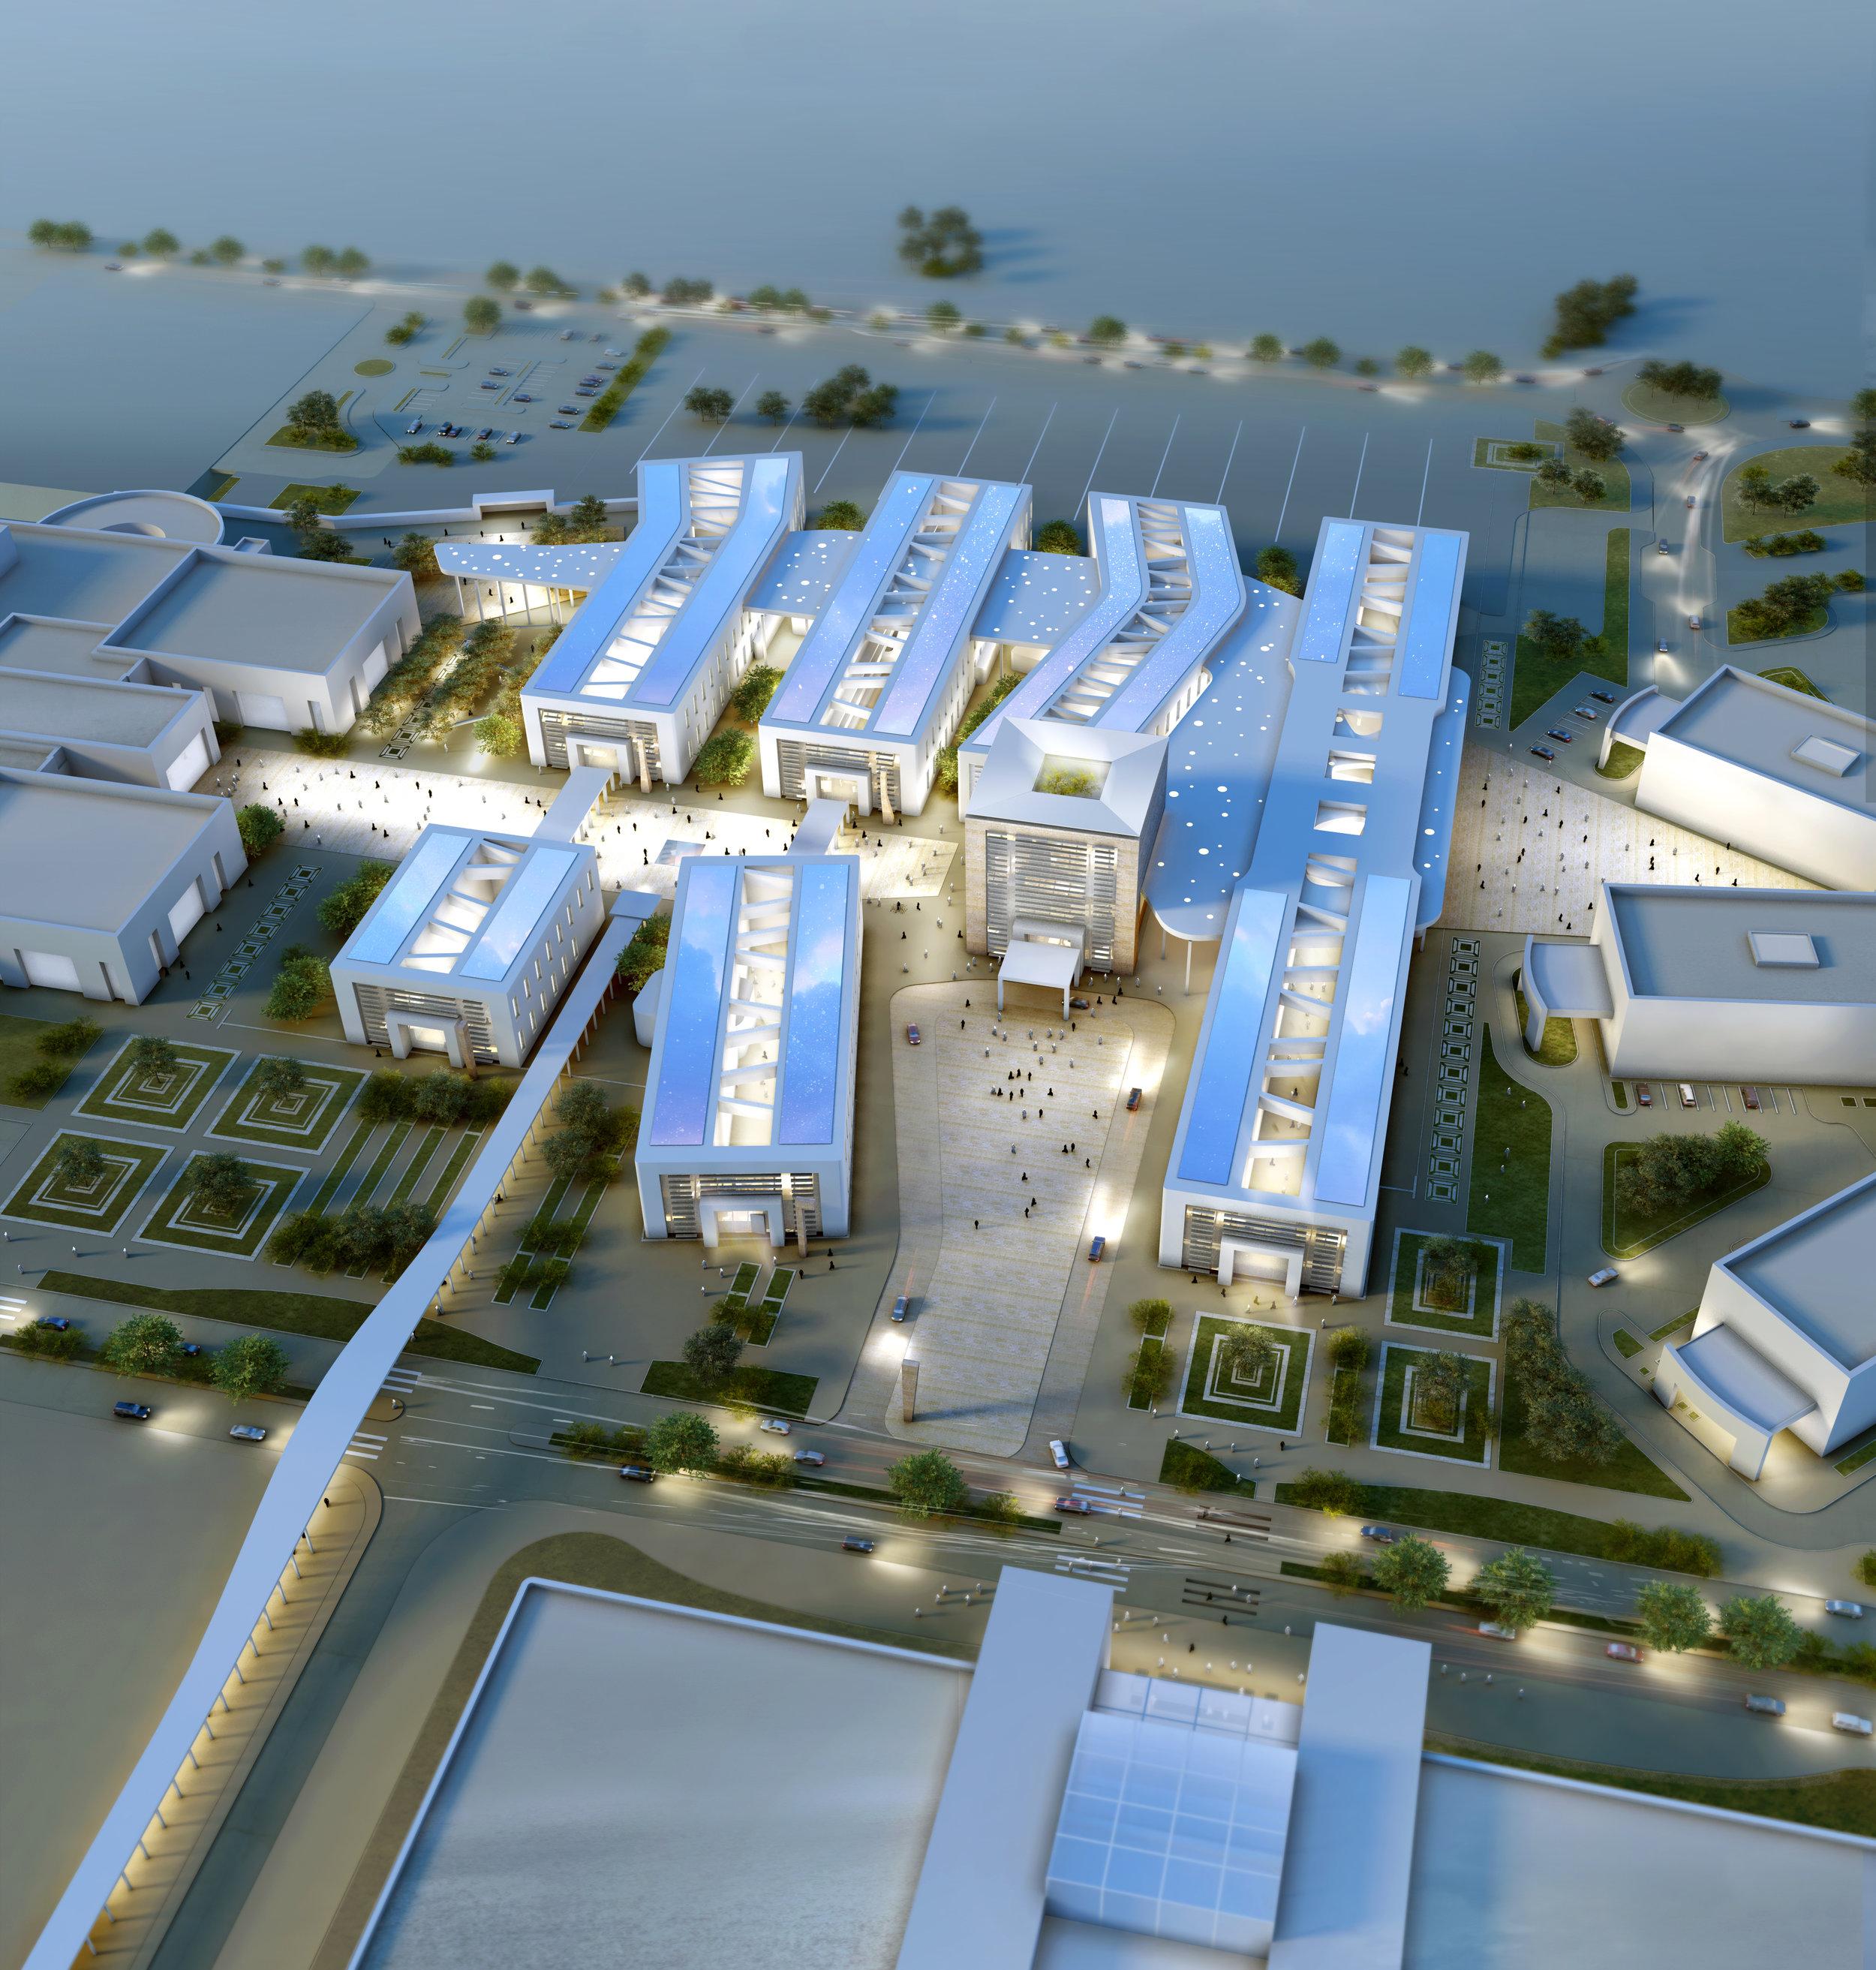 Qatar University Aerial.jpg